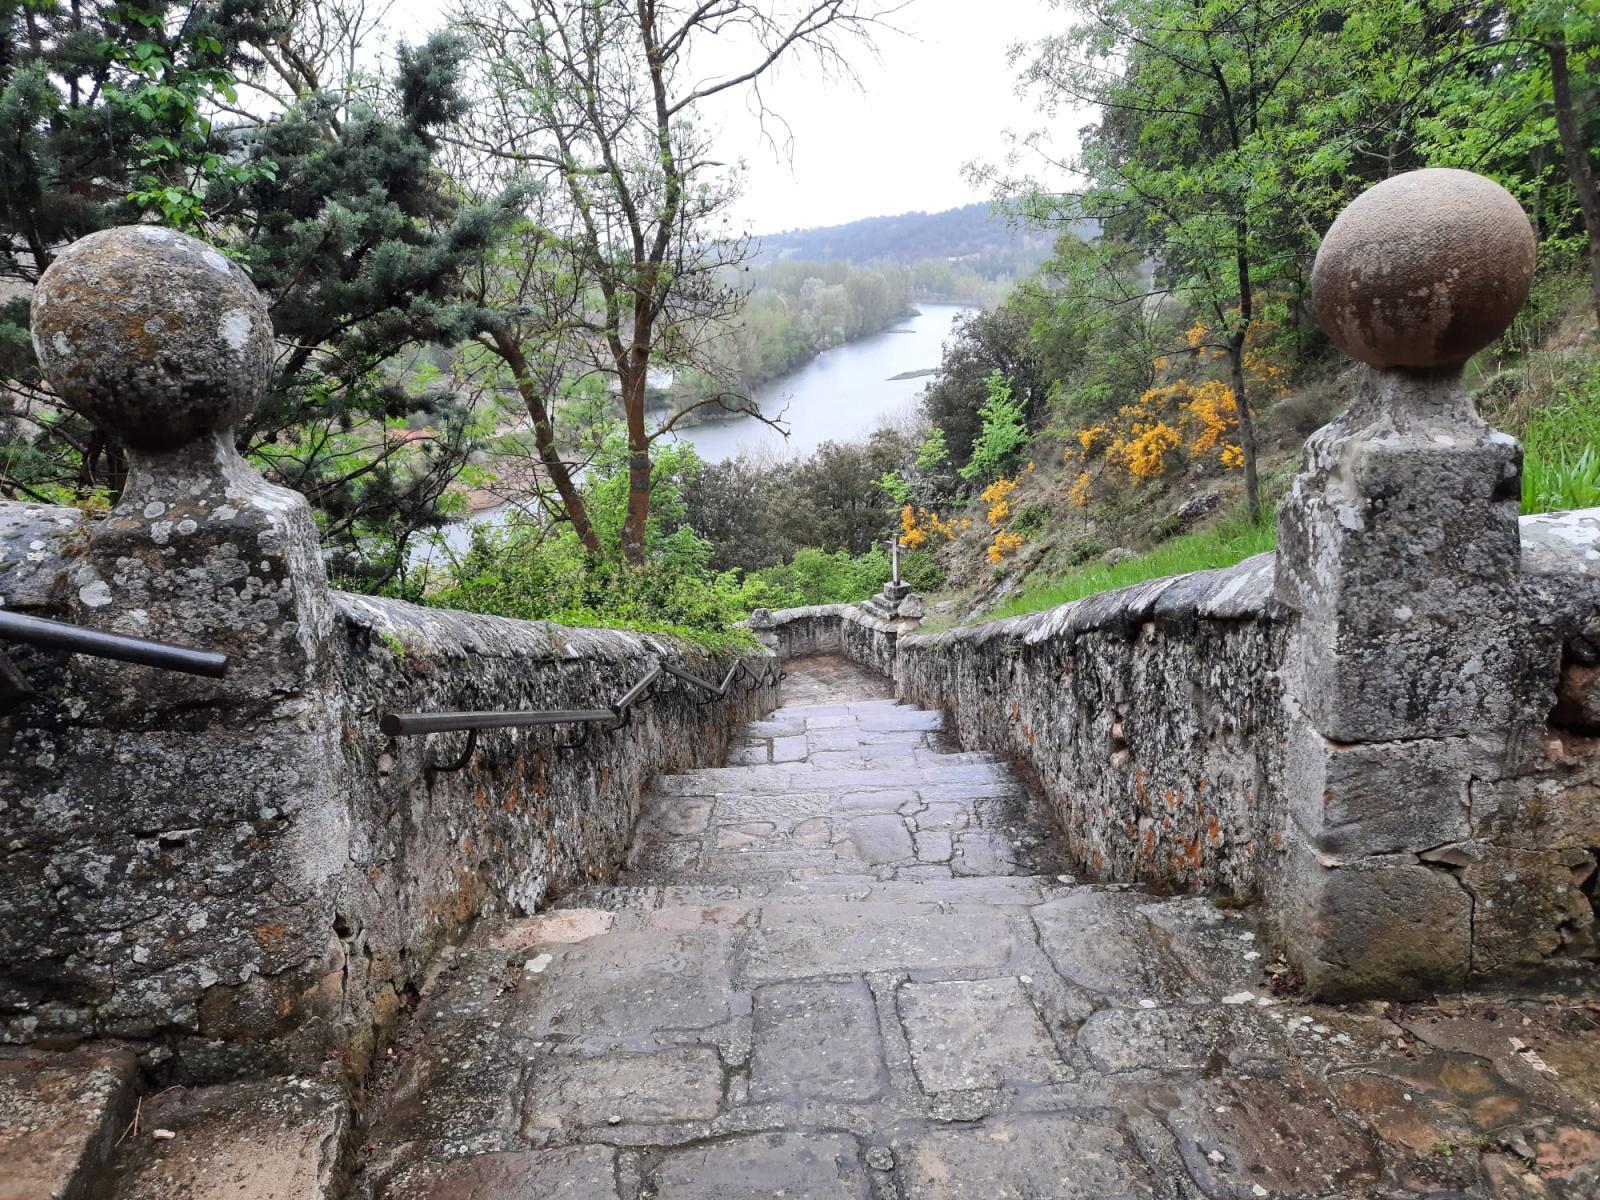 Visita Guiada-Orillas del Duero (Literaria)